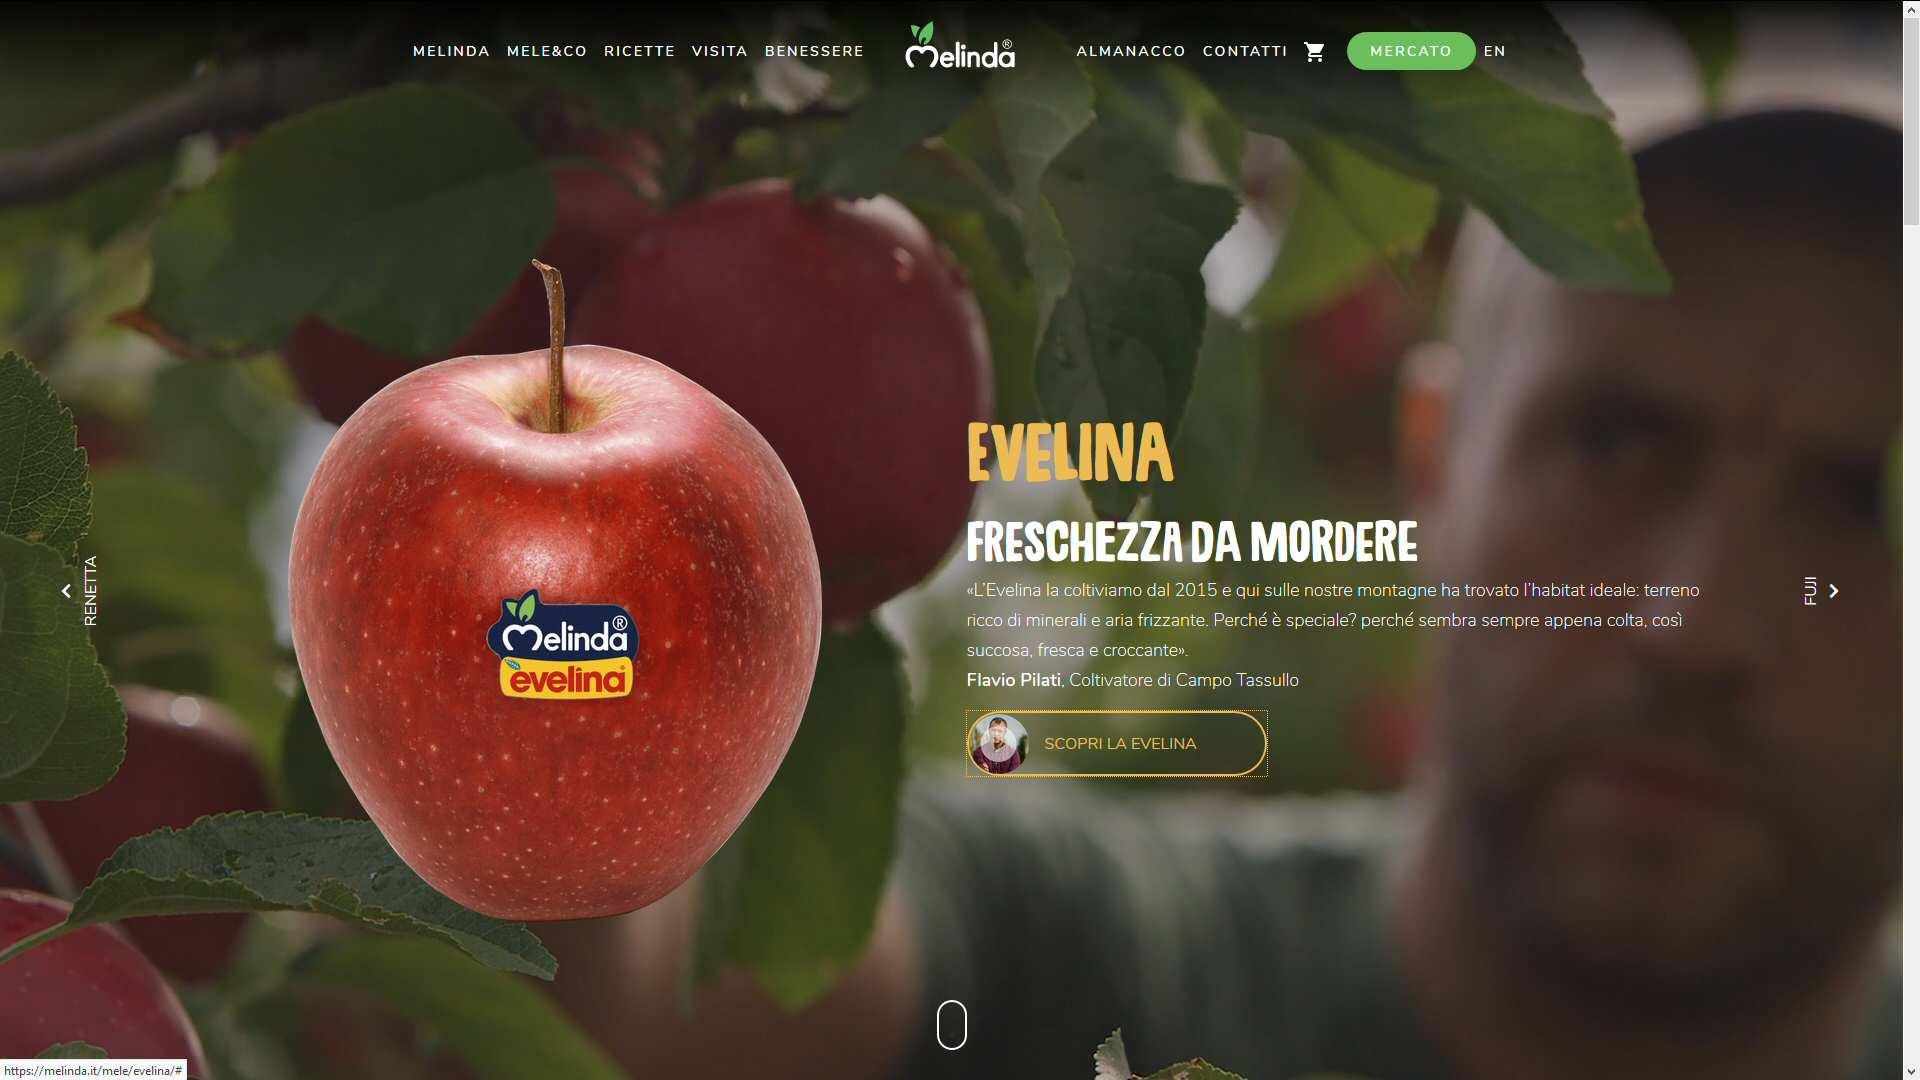 Melinda: strategia digitale e concept, contenuti/SEO/website